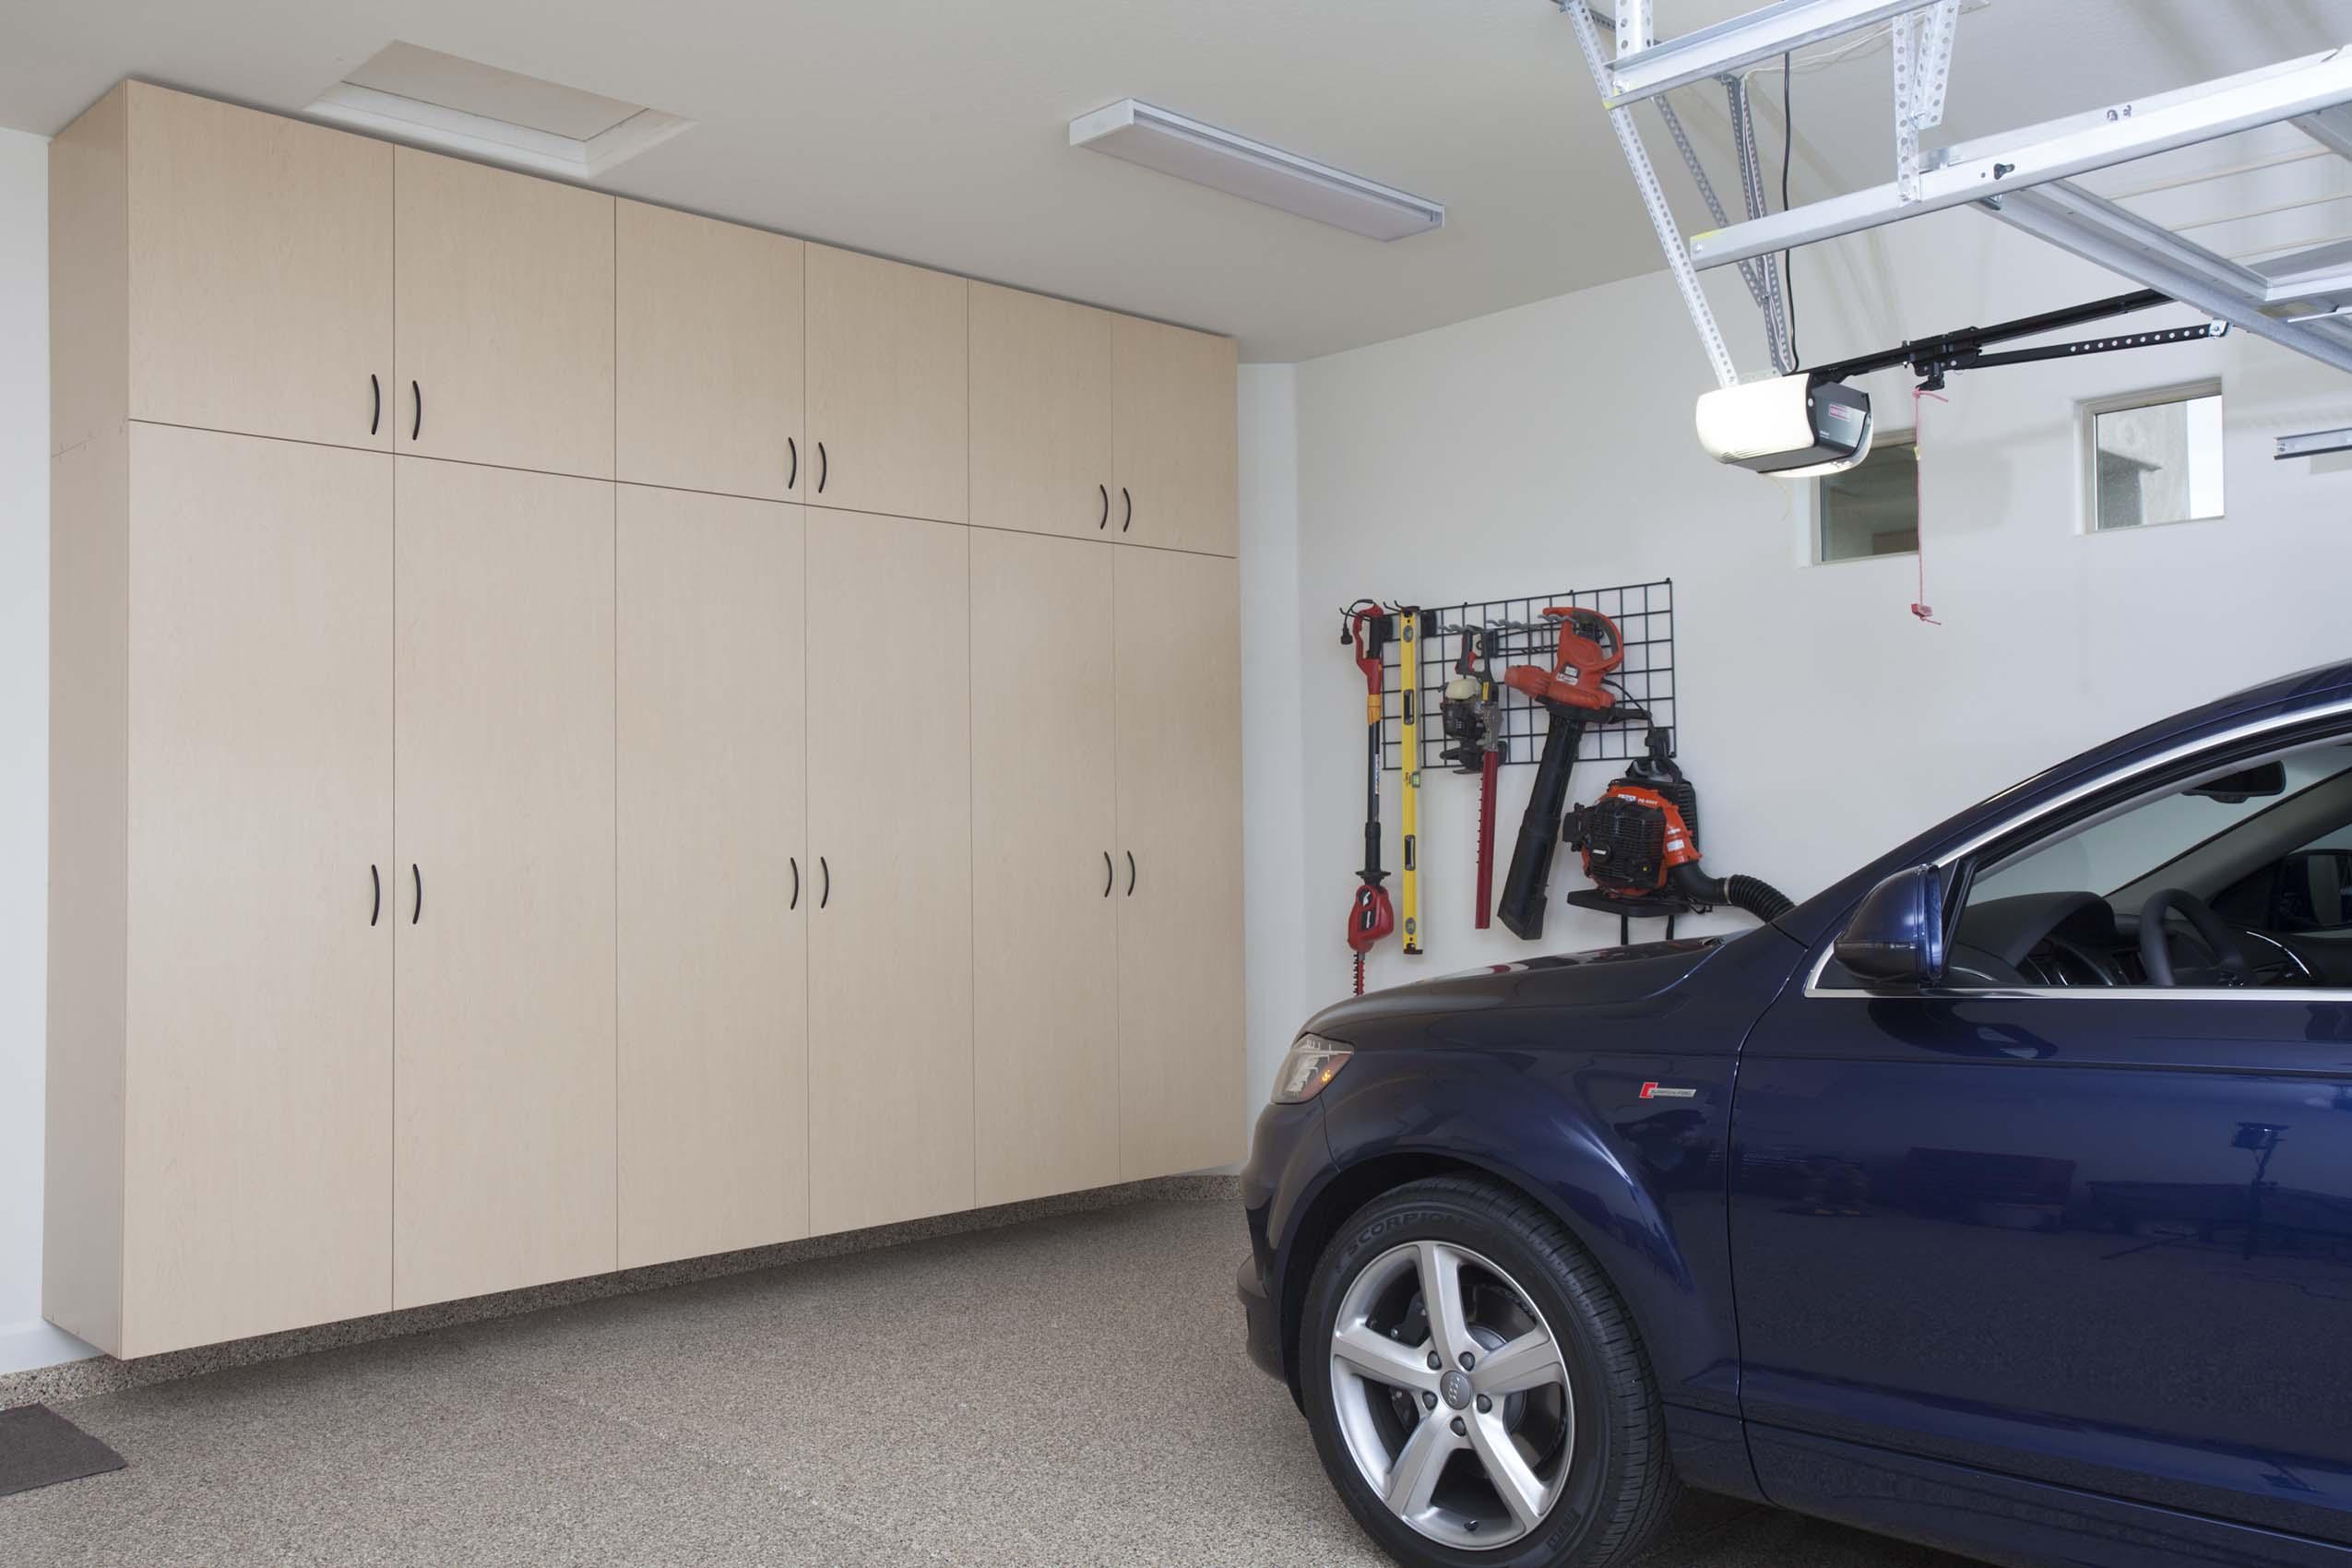 Maple Garage Floor to Ceiling